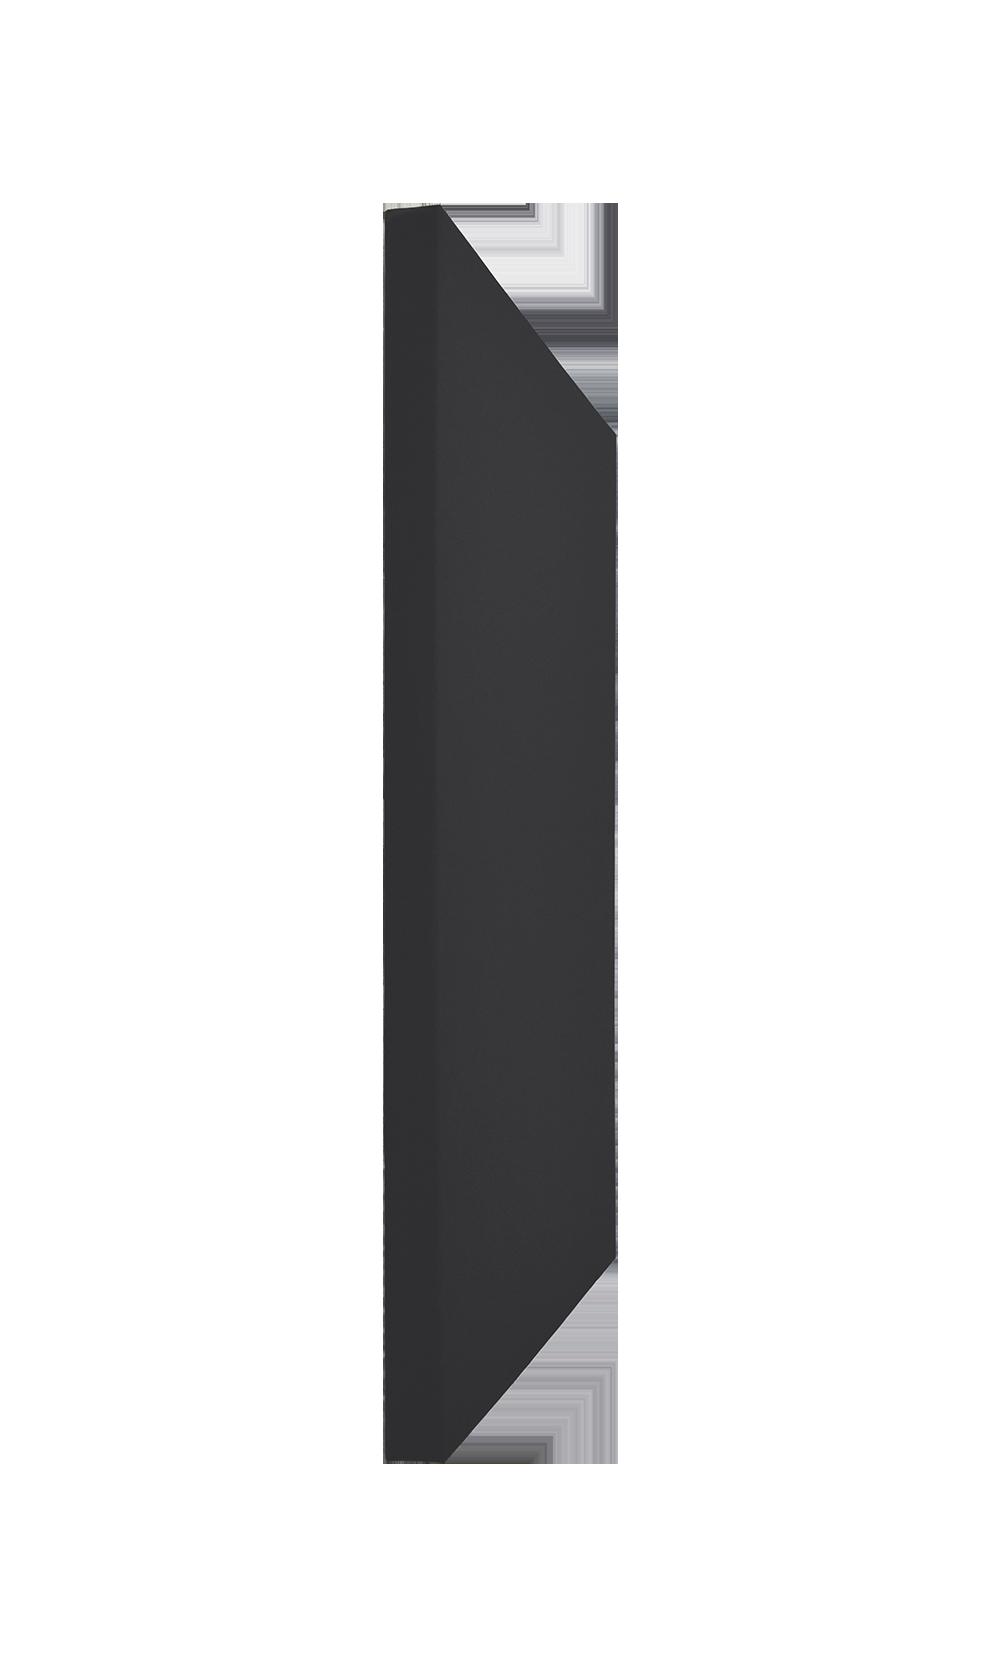 DreamScreen AcoustIQ Rectangle Absorbant 60x120x5cm Sort 1stk